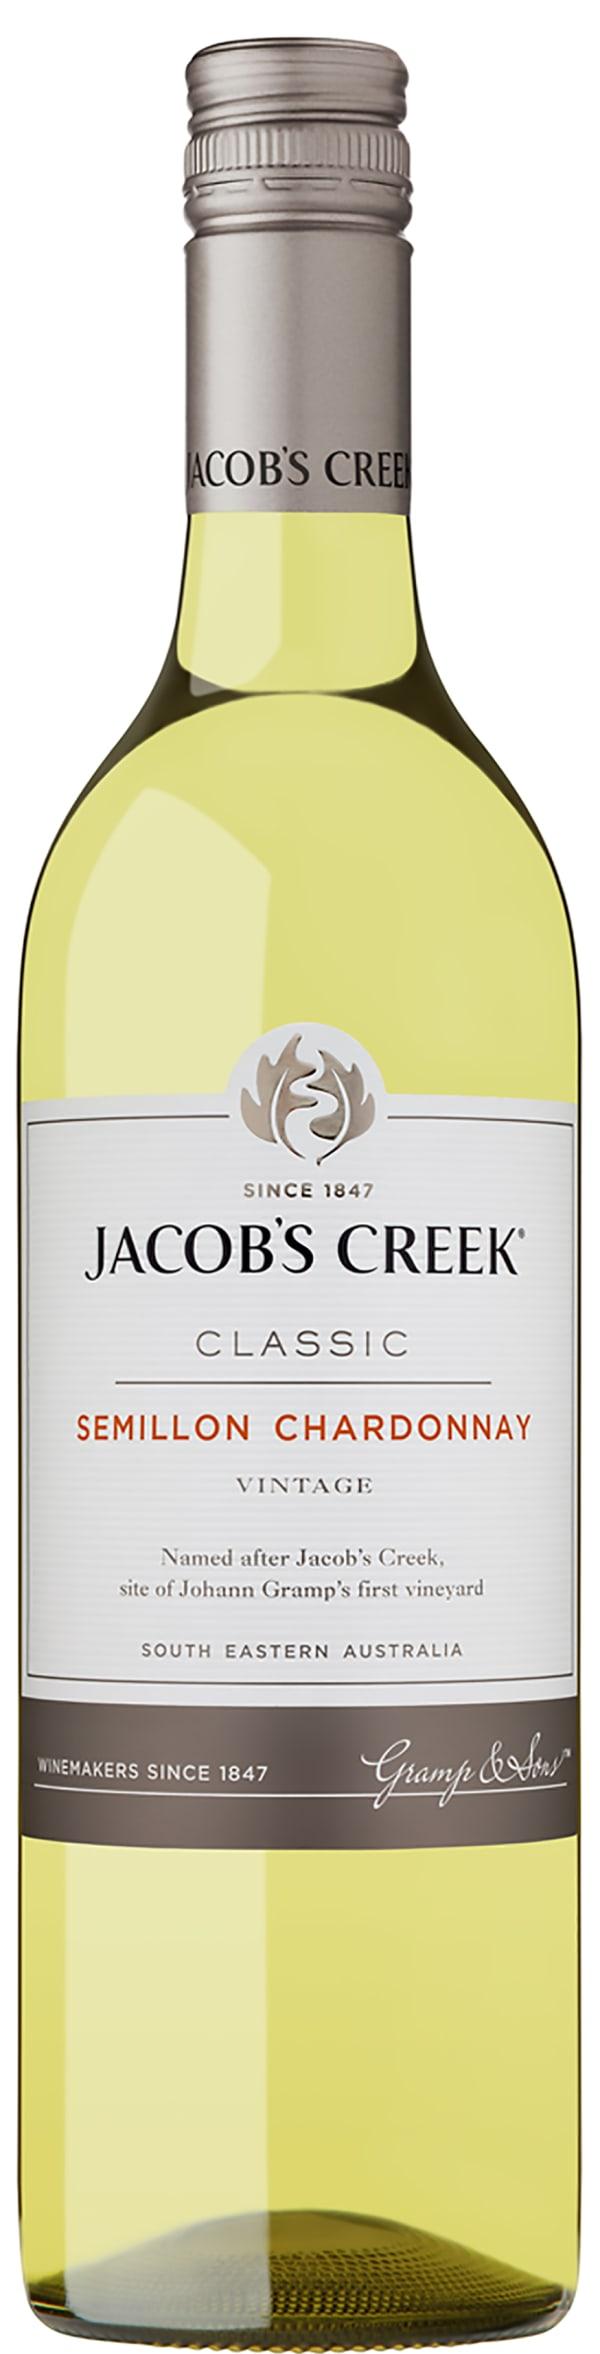 Jacob's Creek Semillon Chardonnay 2018